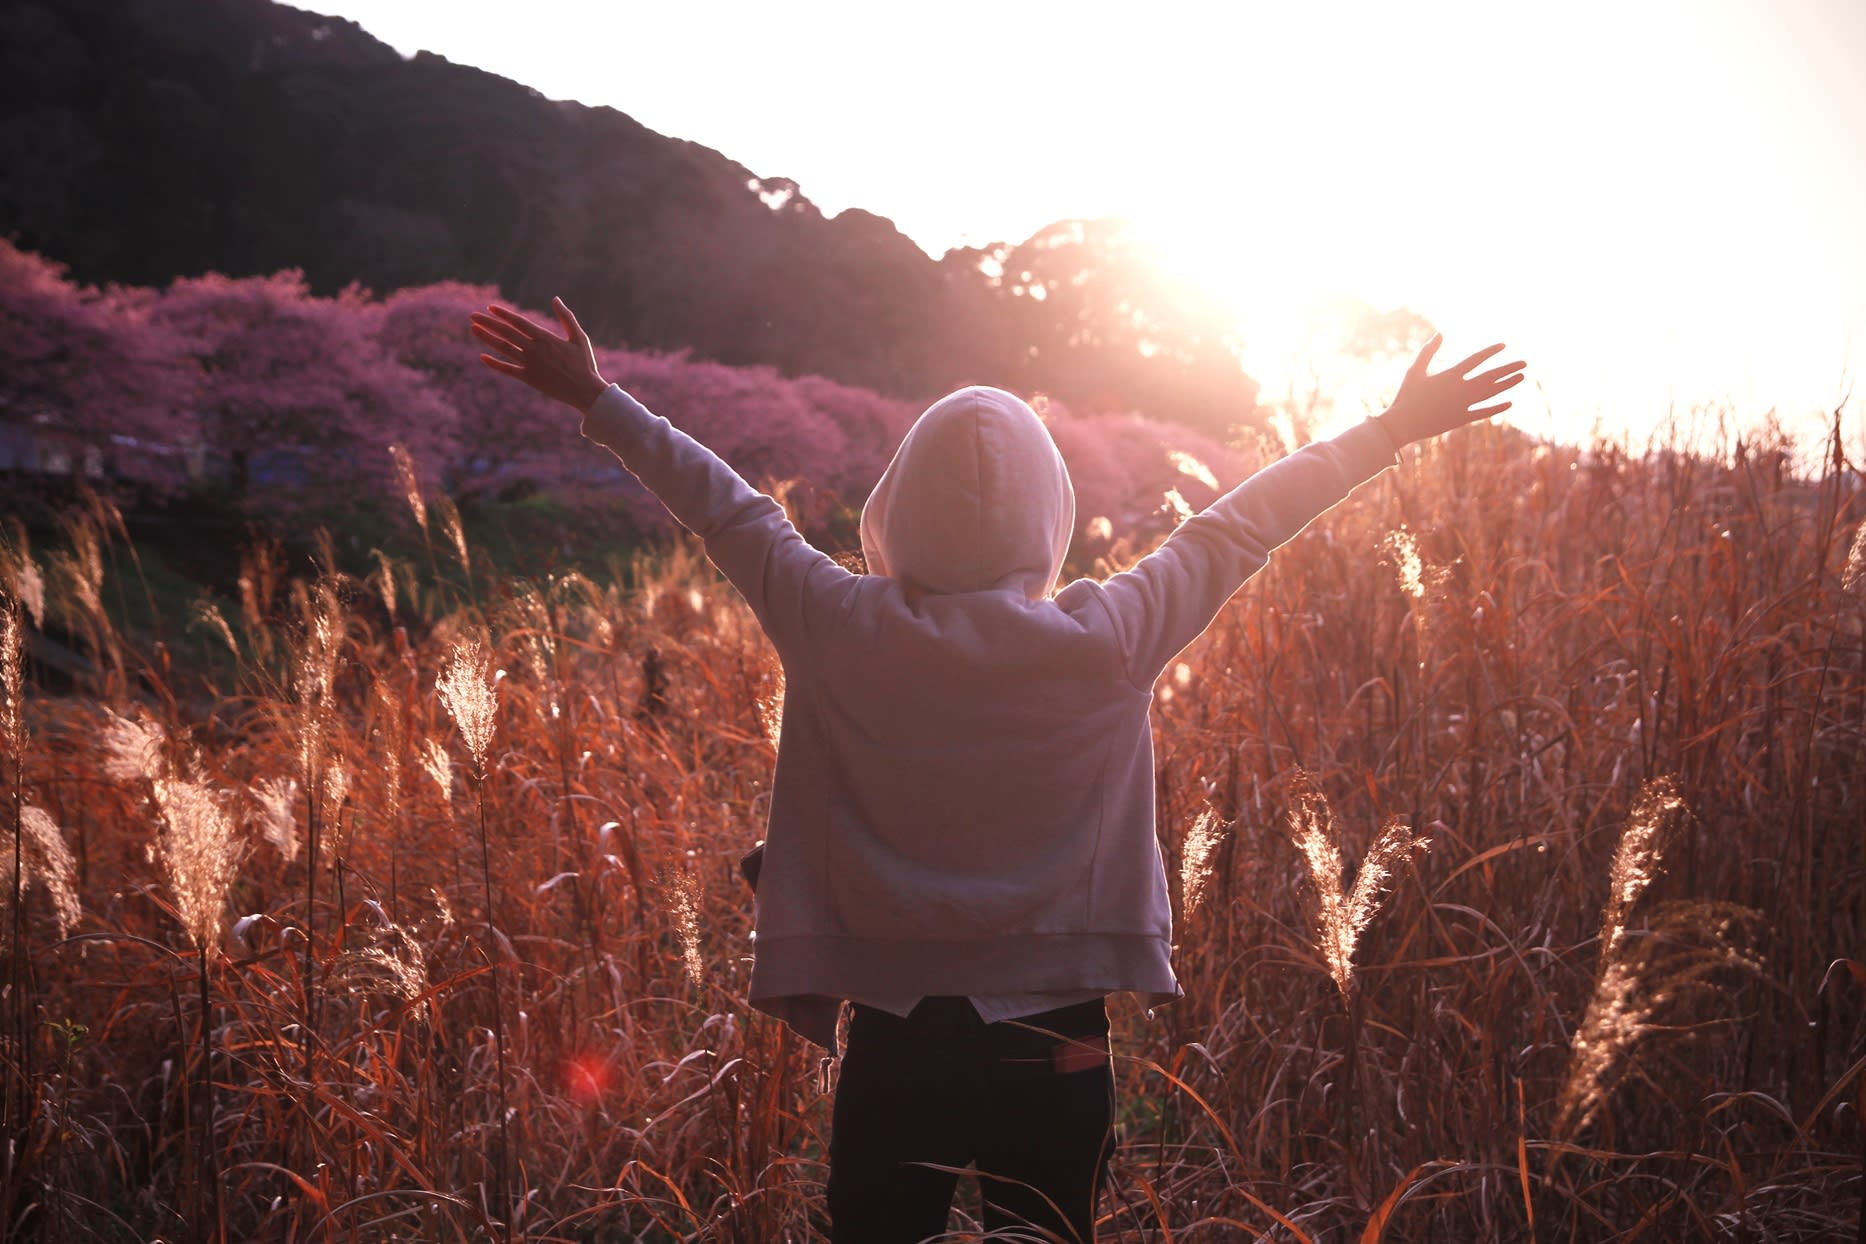 Ngắm Kawazu-zakura và trời sao tại Miurakaigan, Kanazawa-ken 6